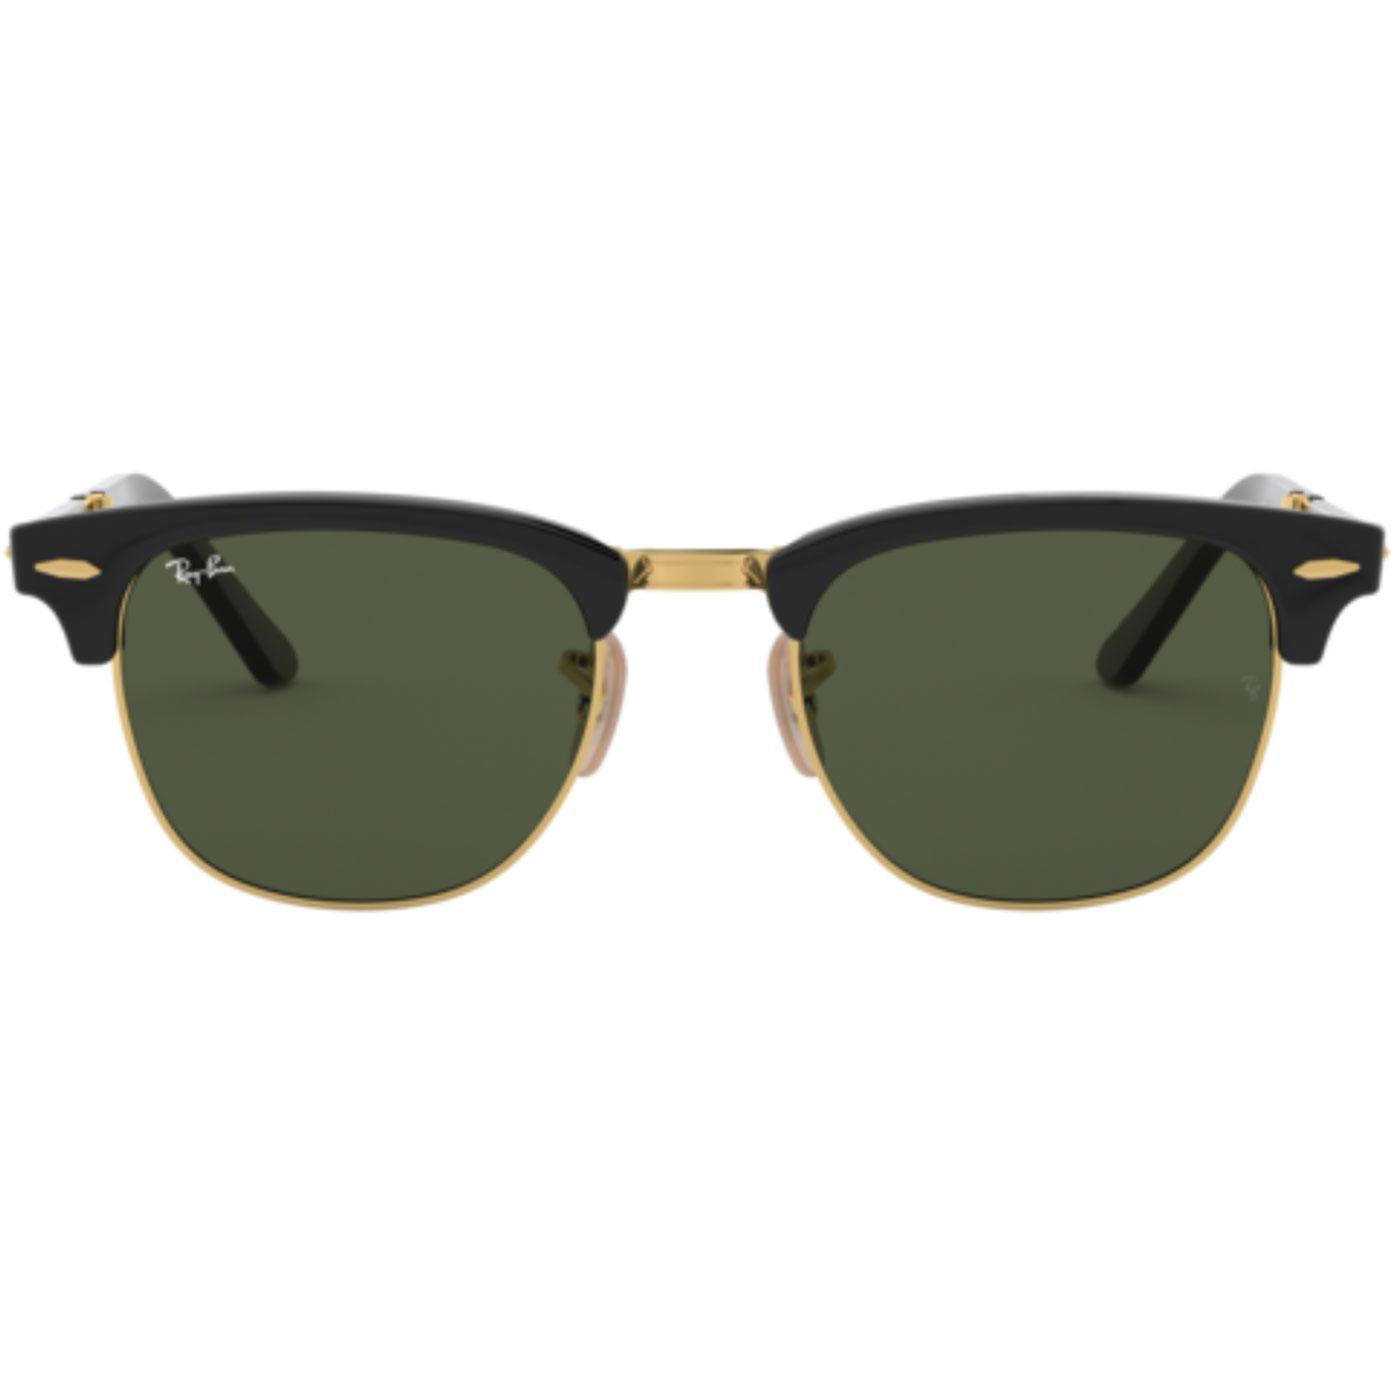 Folding Clubmaster RAY-BAN Retro 50s Sunglasses